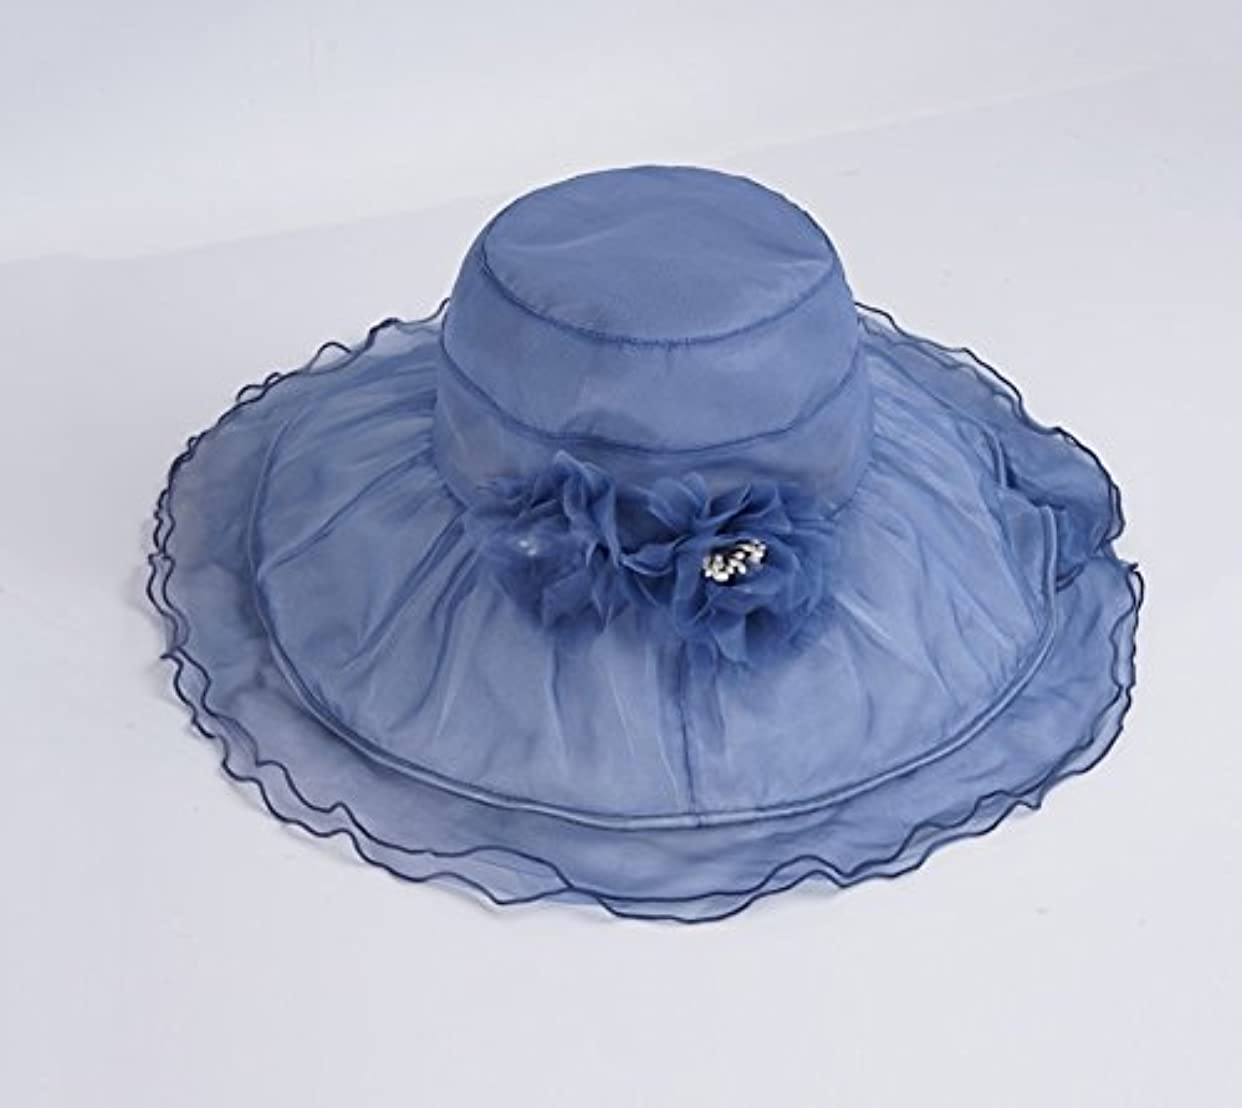 sunhat outdoor旅行の海辺のビーチ帽子休暇Collapsible Sun hat ( 色 : #3 )